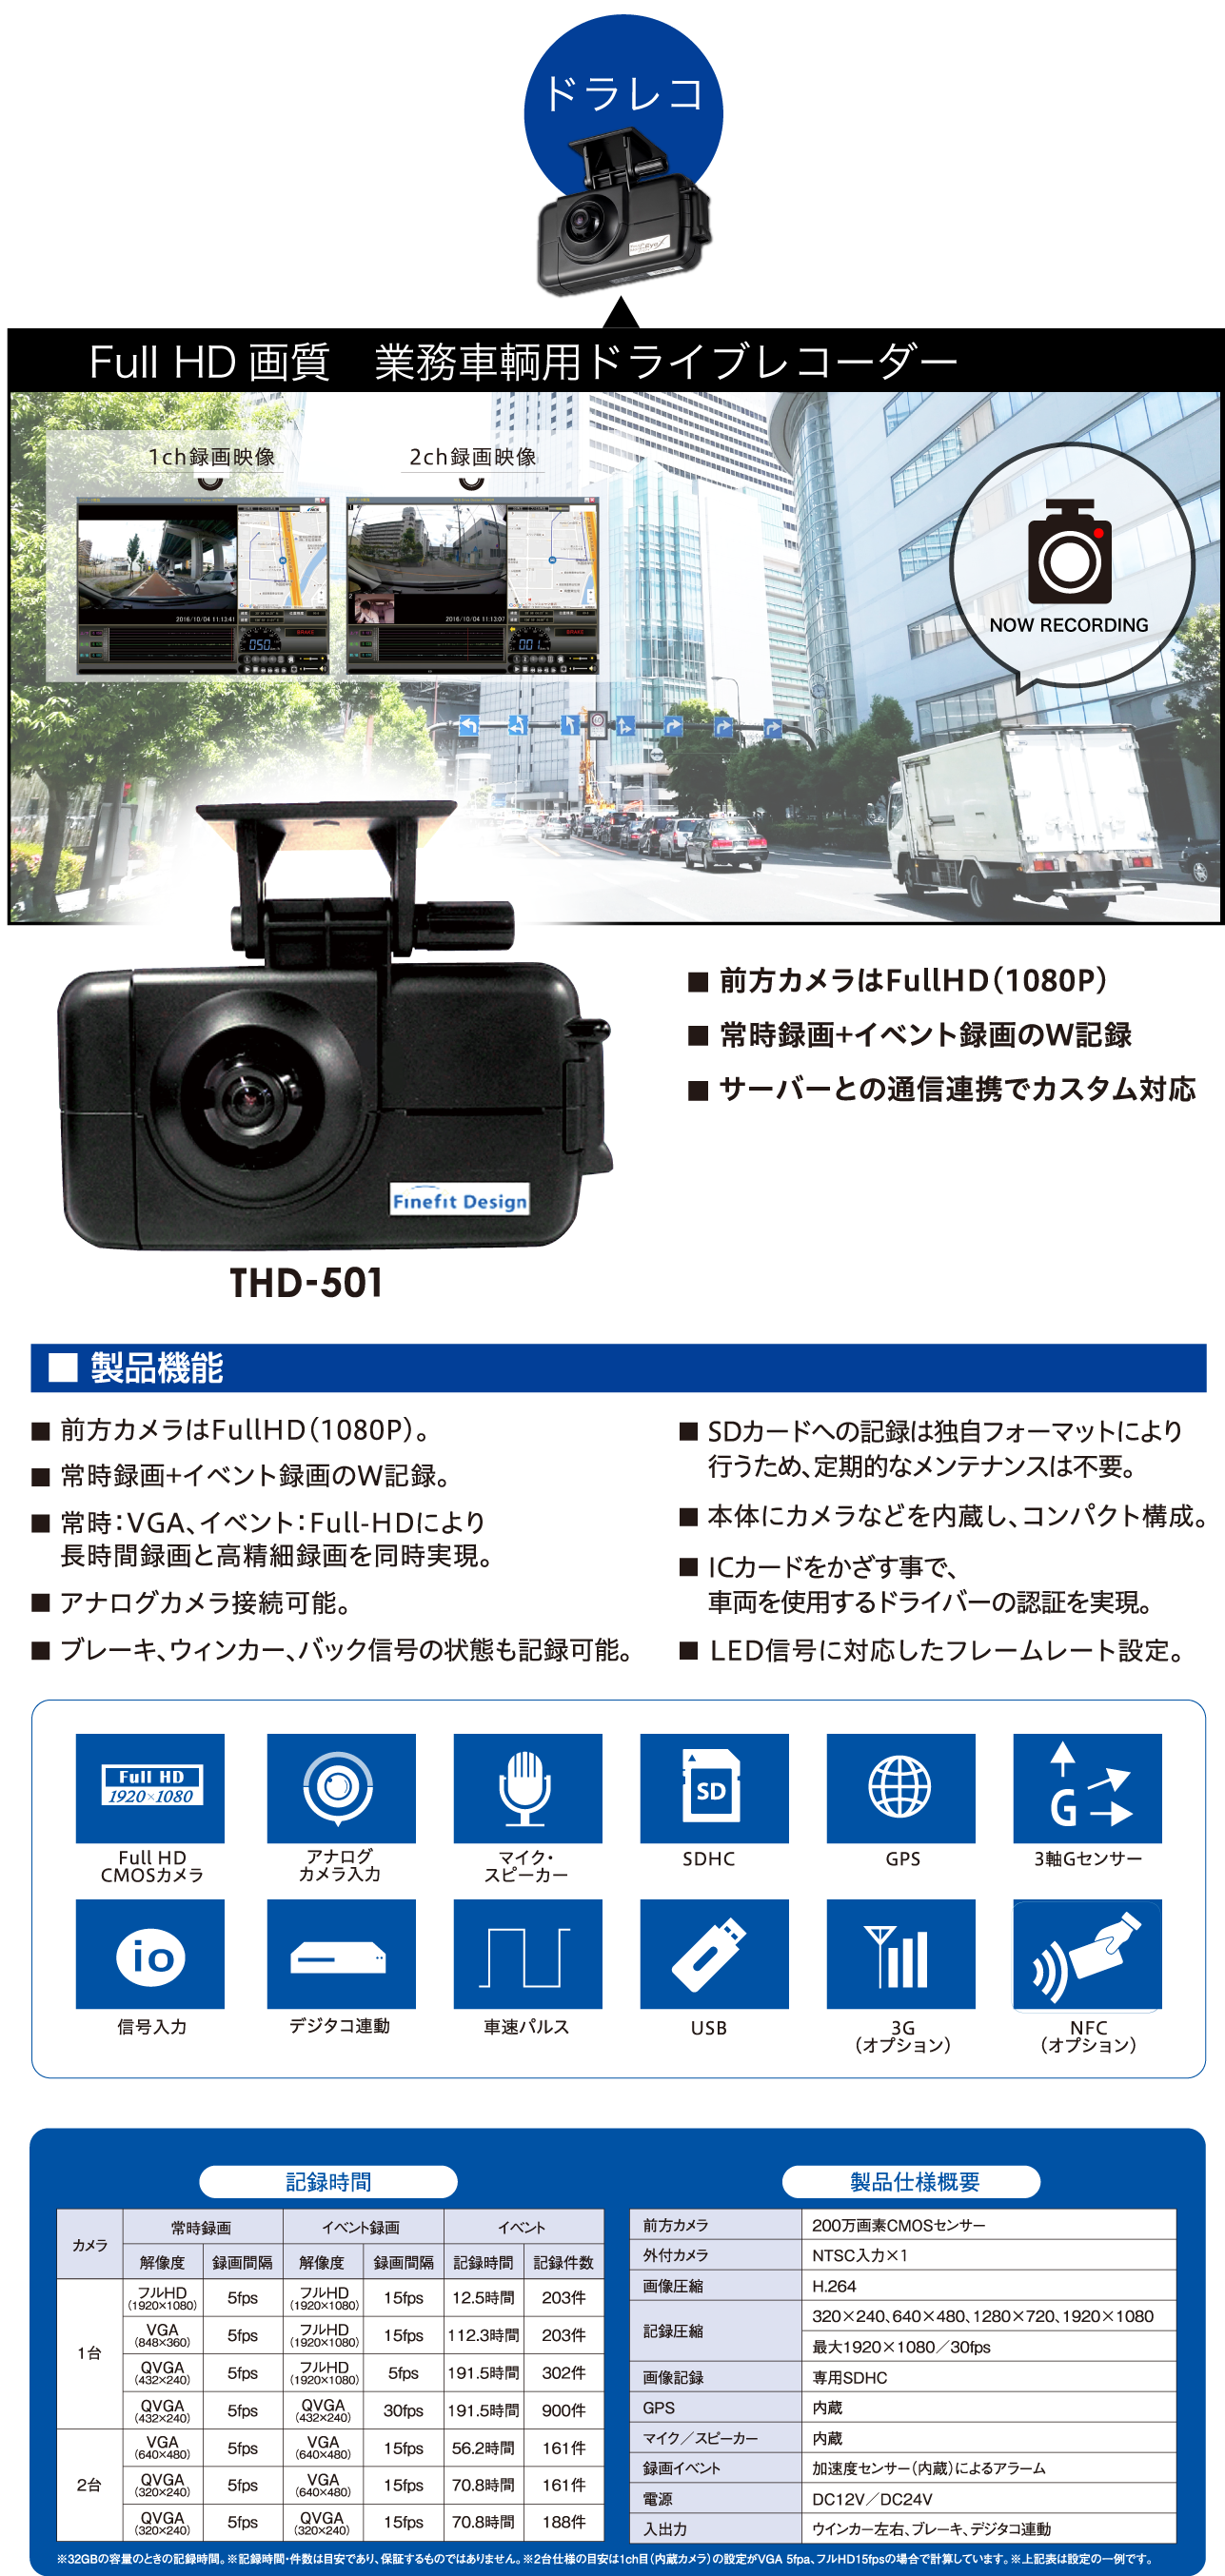 Full HD画質 業務車輌用ドライブレコーダー